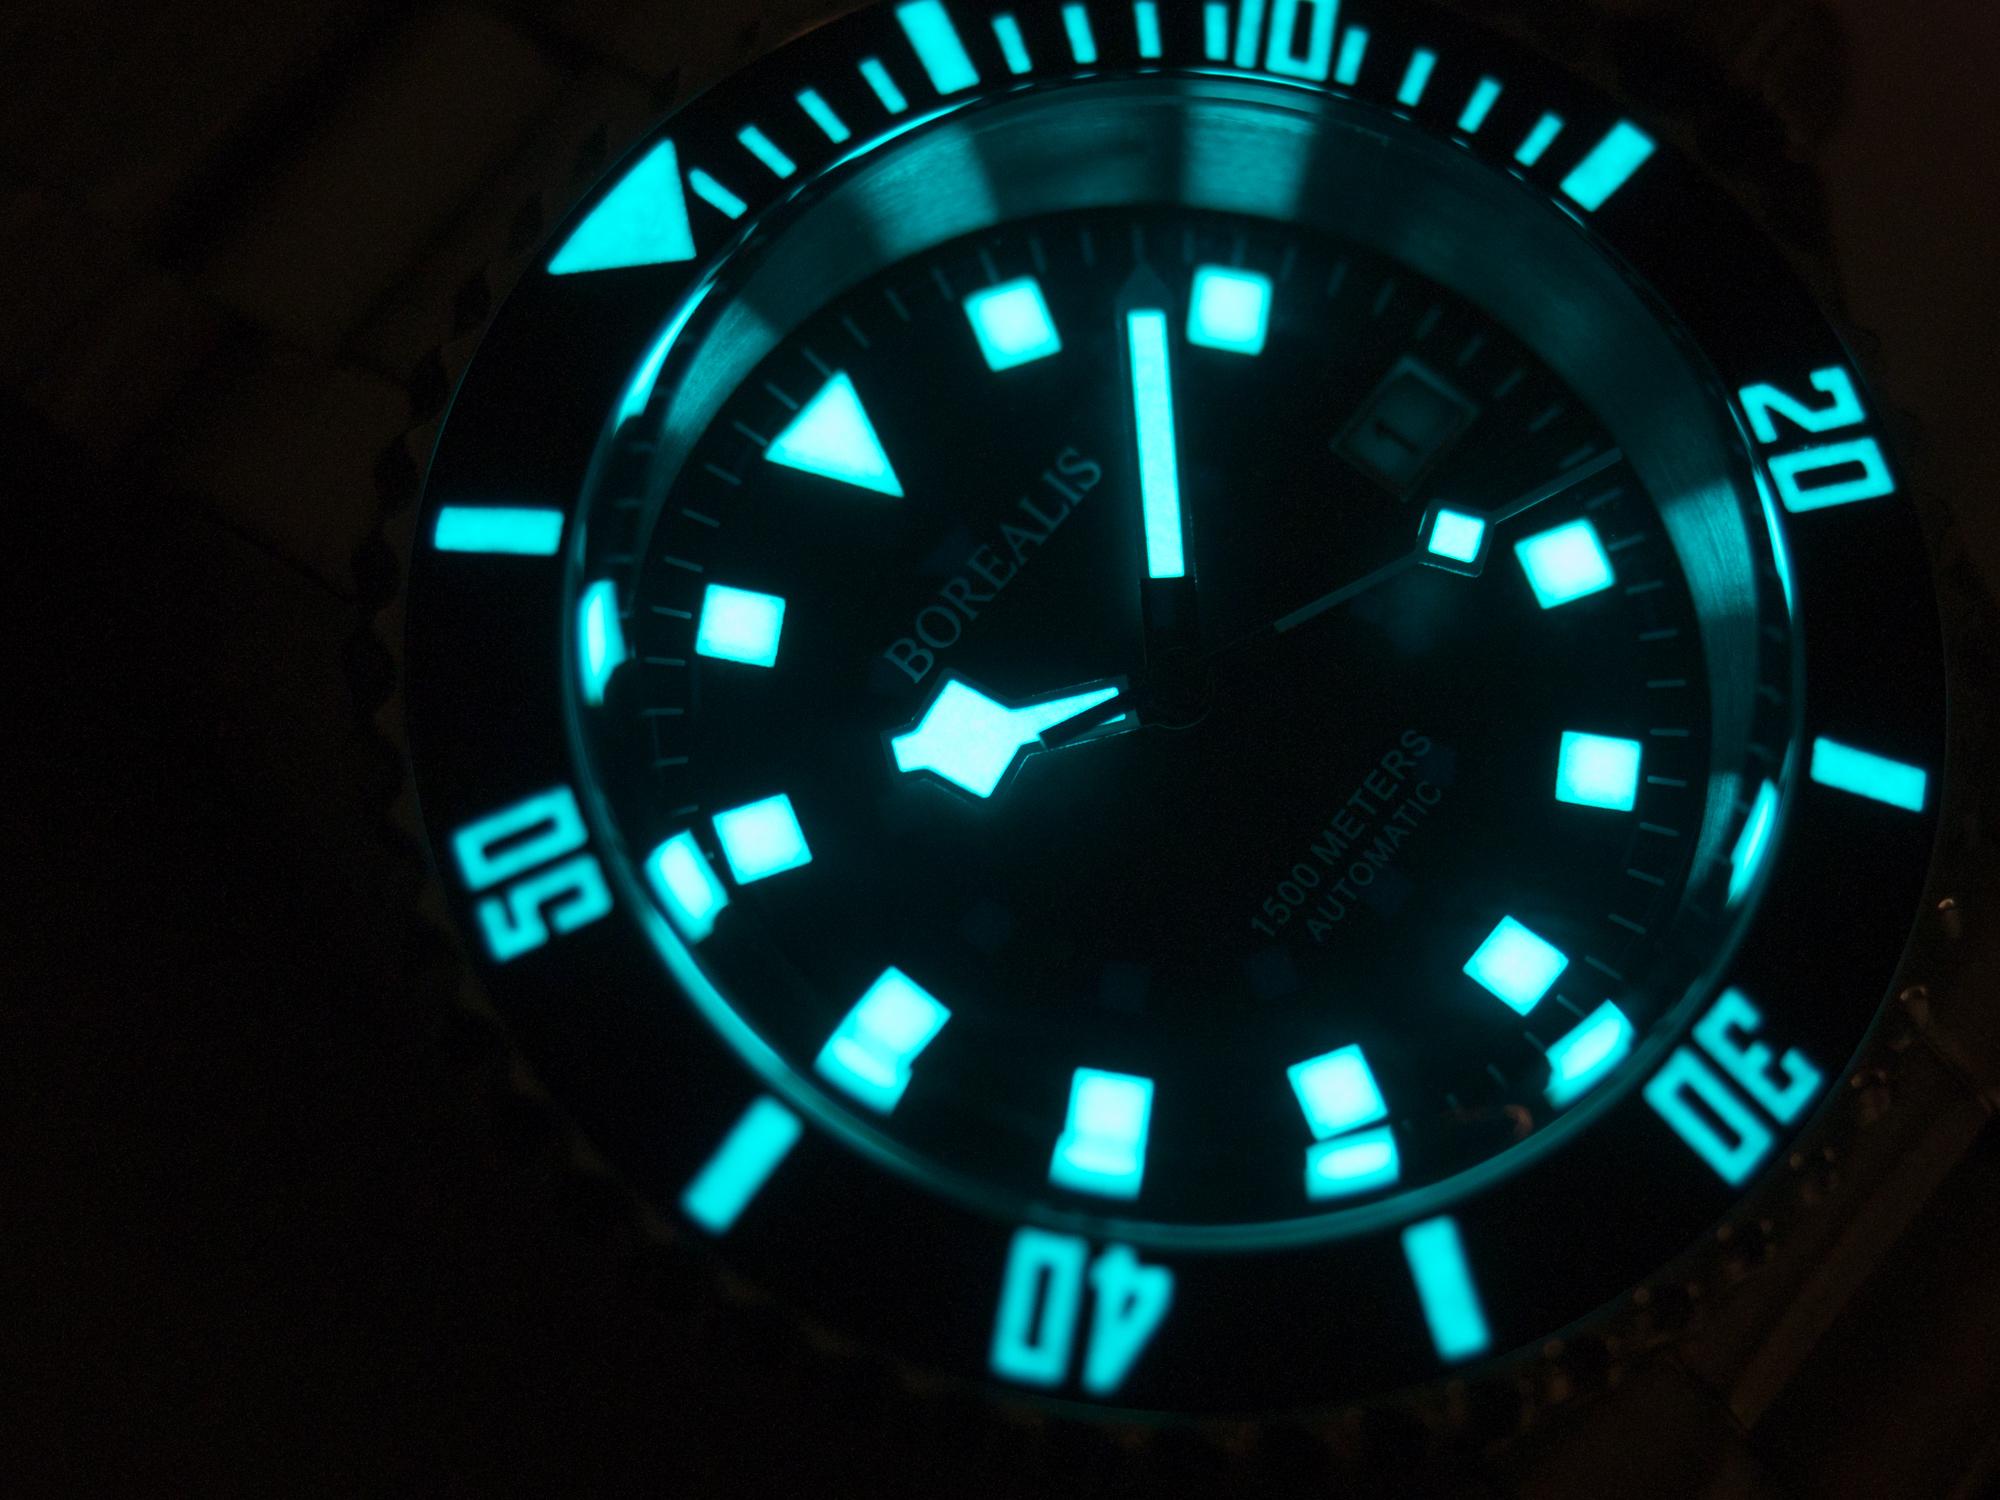 Borealis Sea Hawk 1500m Automatic Diver Watch Seiko NH36 / 4R36 Ceramic Blue Bezel Blue Dial Lume